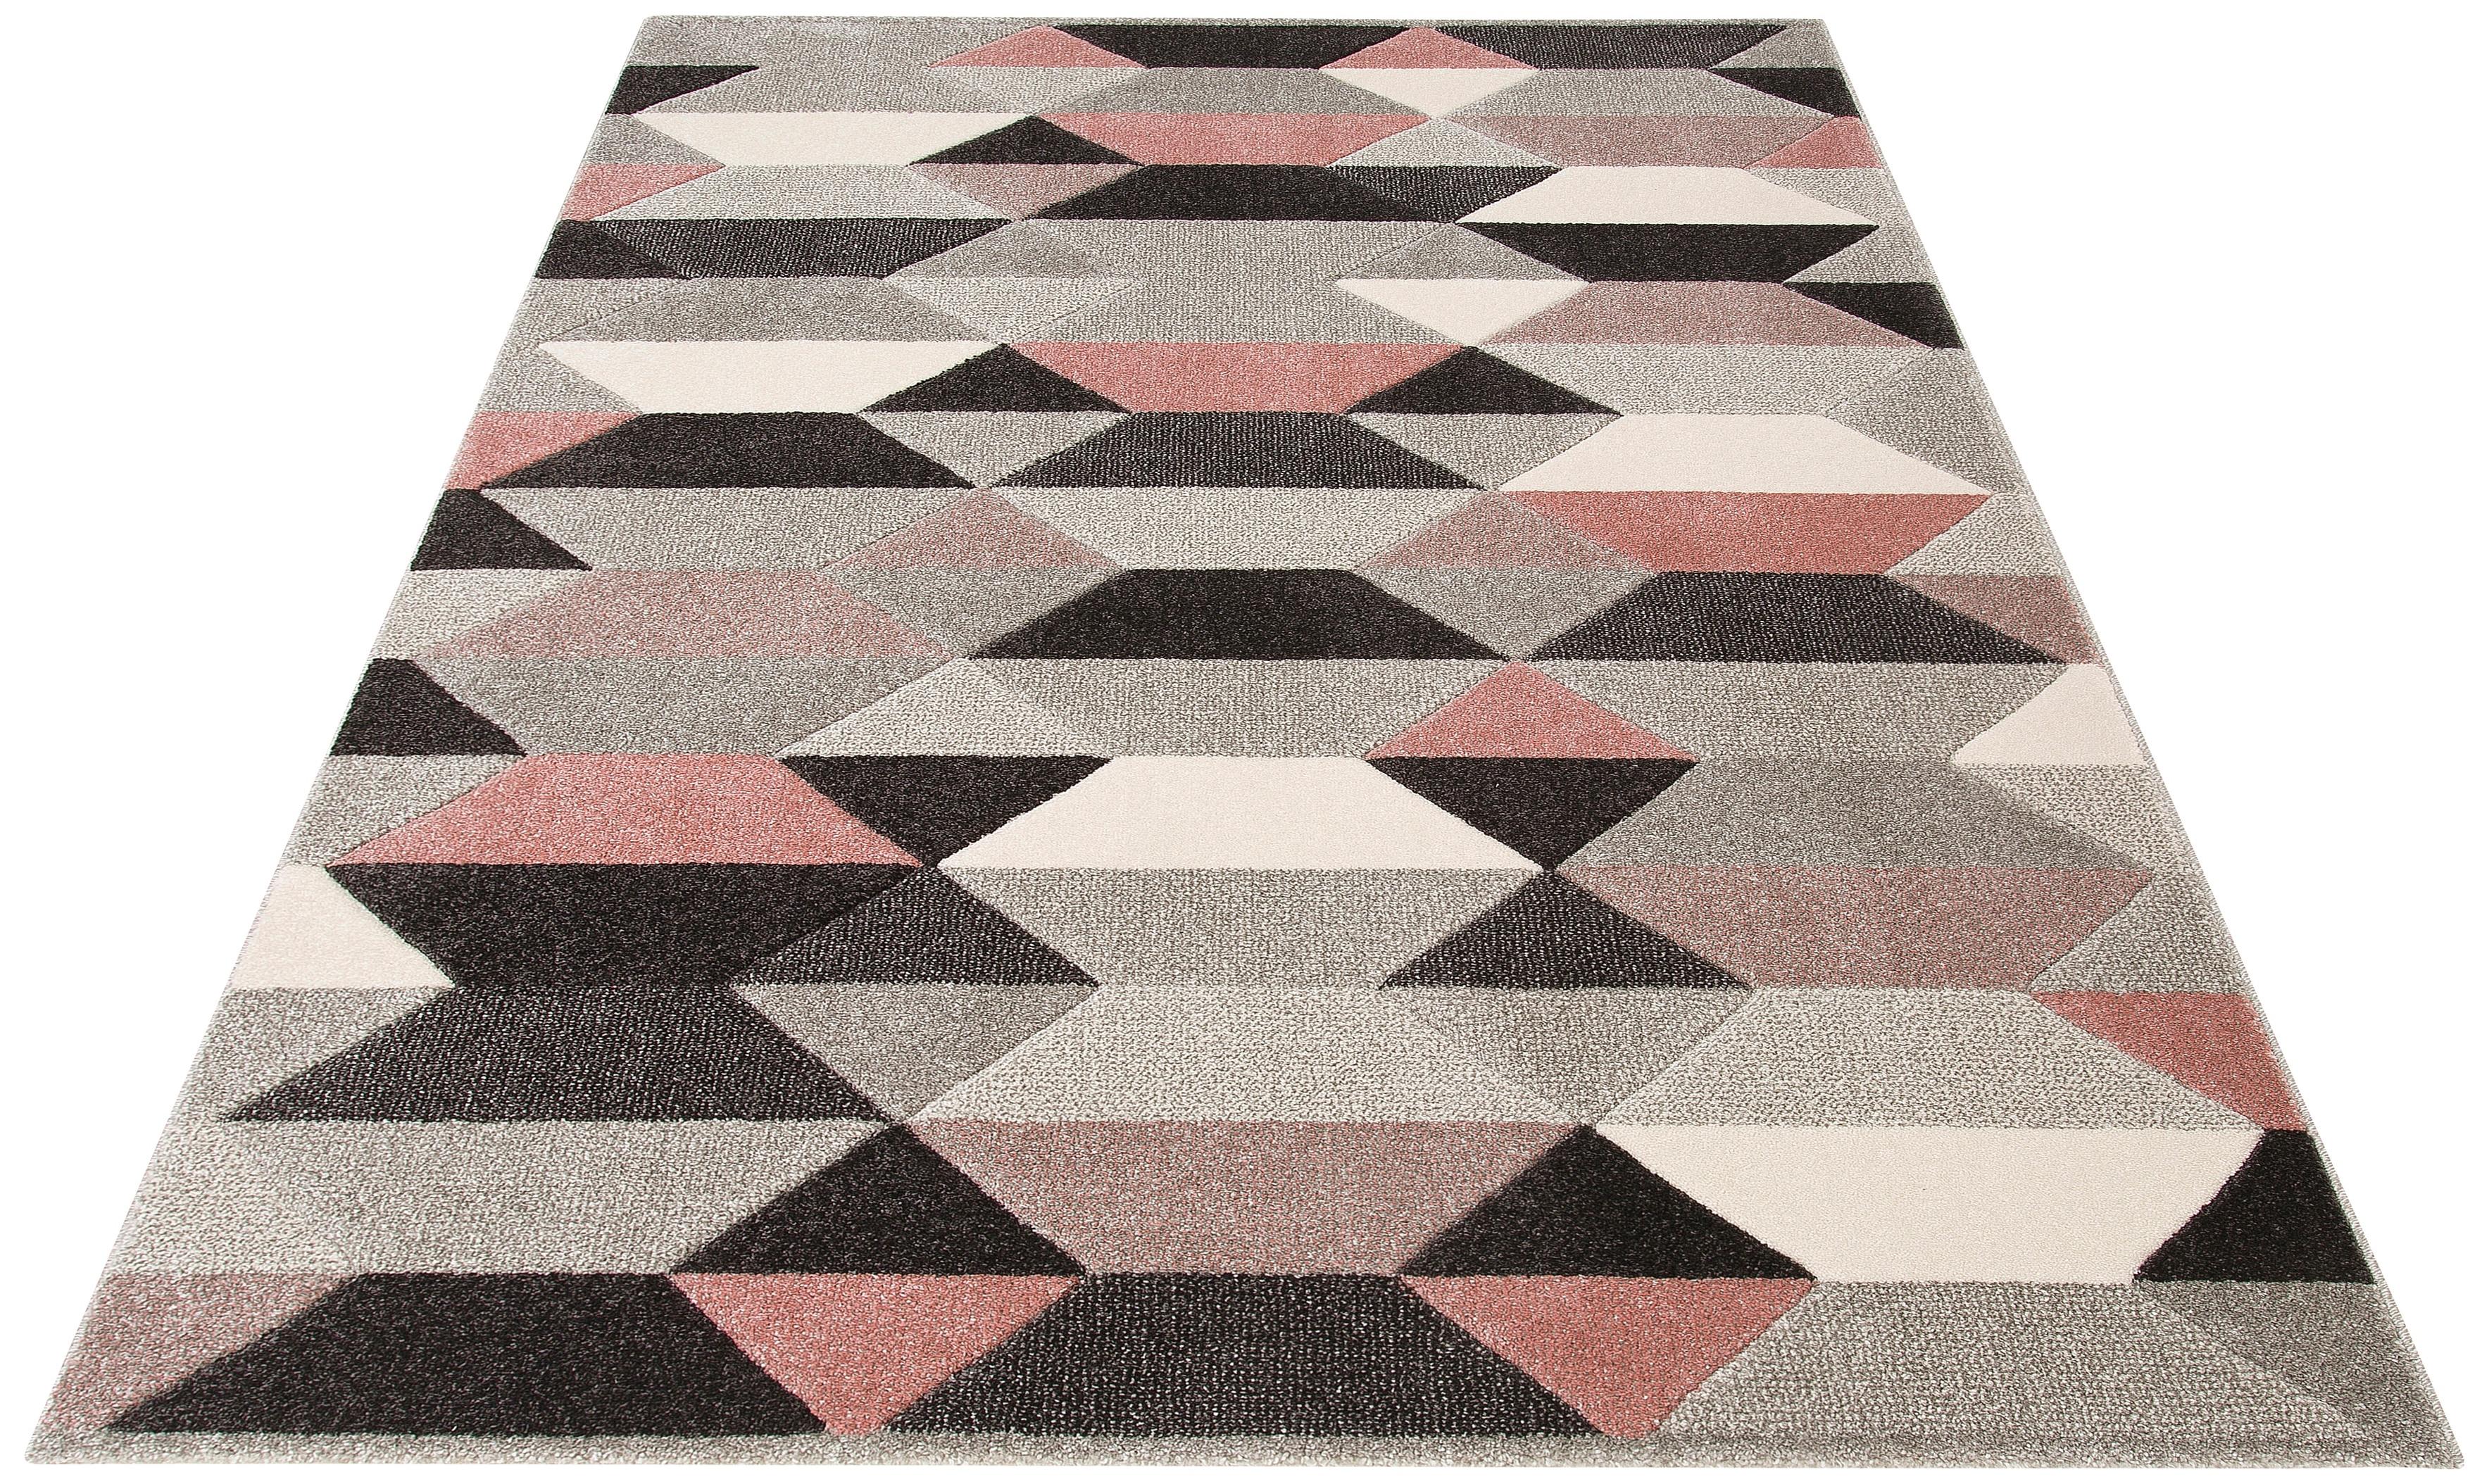 Teppich Ravi my home rechteckig Höhe 13 mm maschinell gewebt